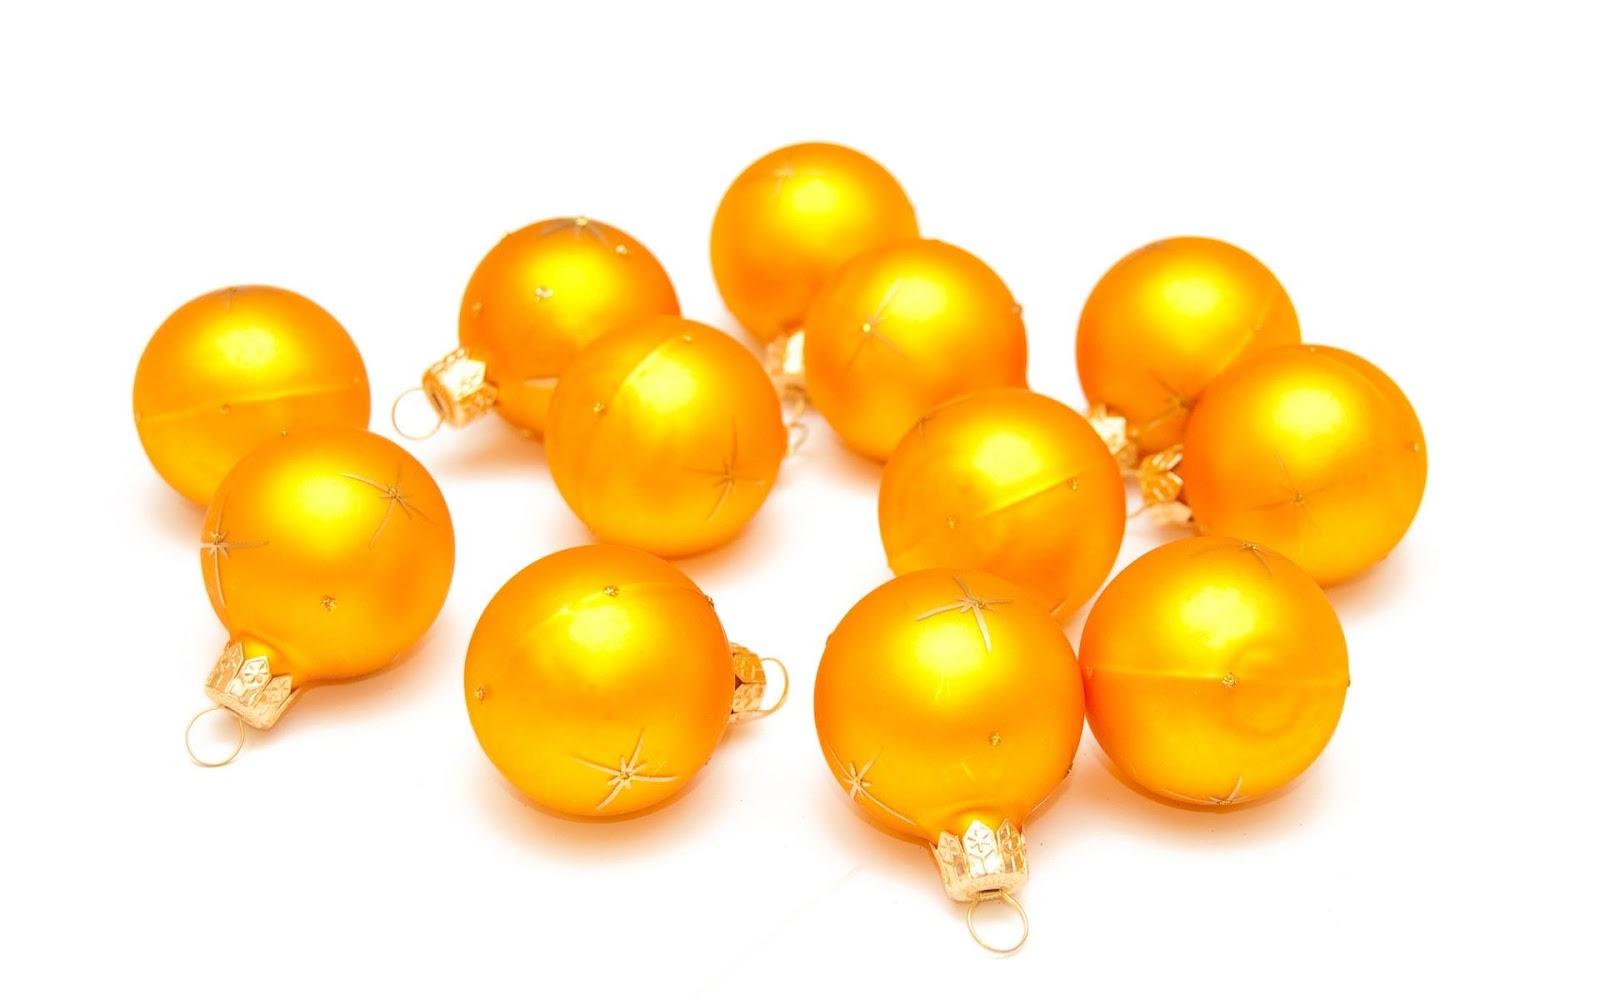 http://1.bp.blogspot.com/-A1zNR_XVB8E/ULfmgyB2ioI/AAAAAAAAFZ8/PXjWGIlEQlQ/s1600/Varias+bolas+Navide%C3%B1as.jpg